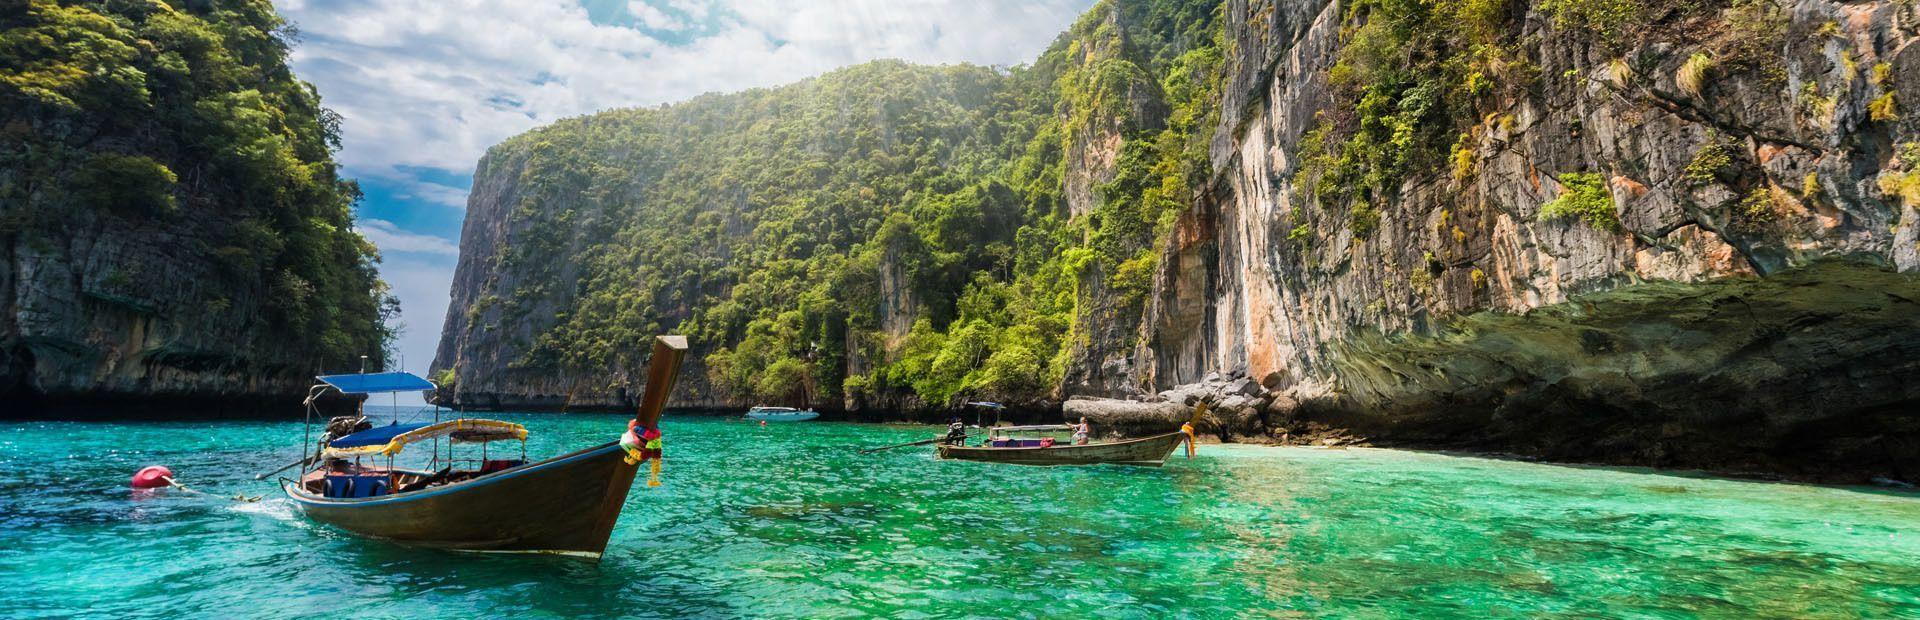 Thailandia: beach life and winter island discovery